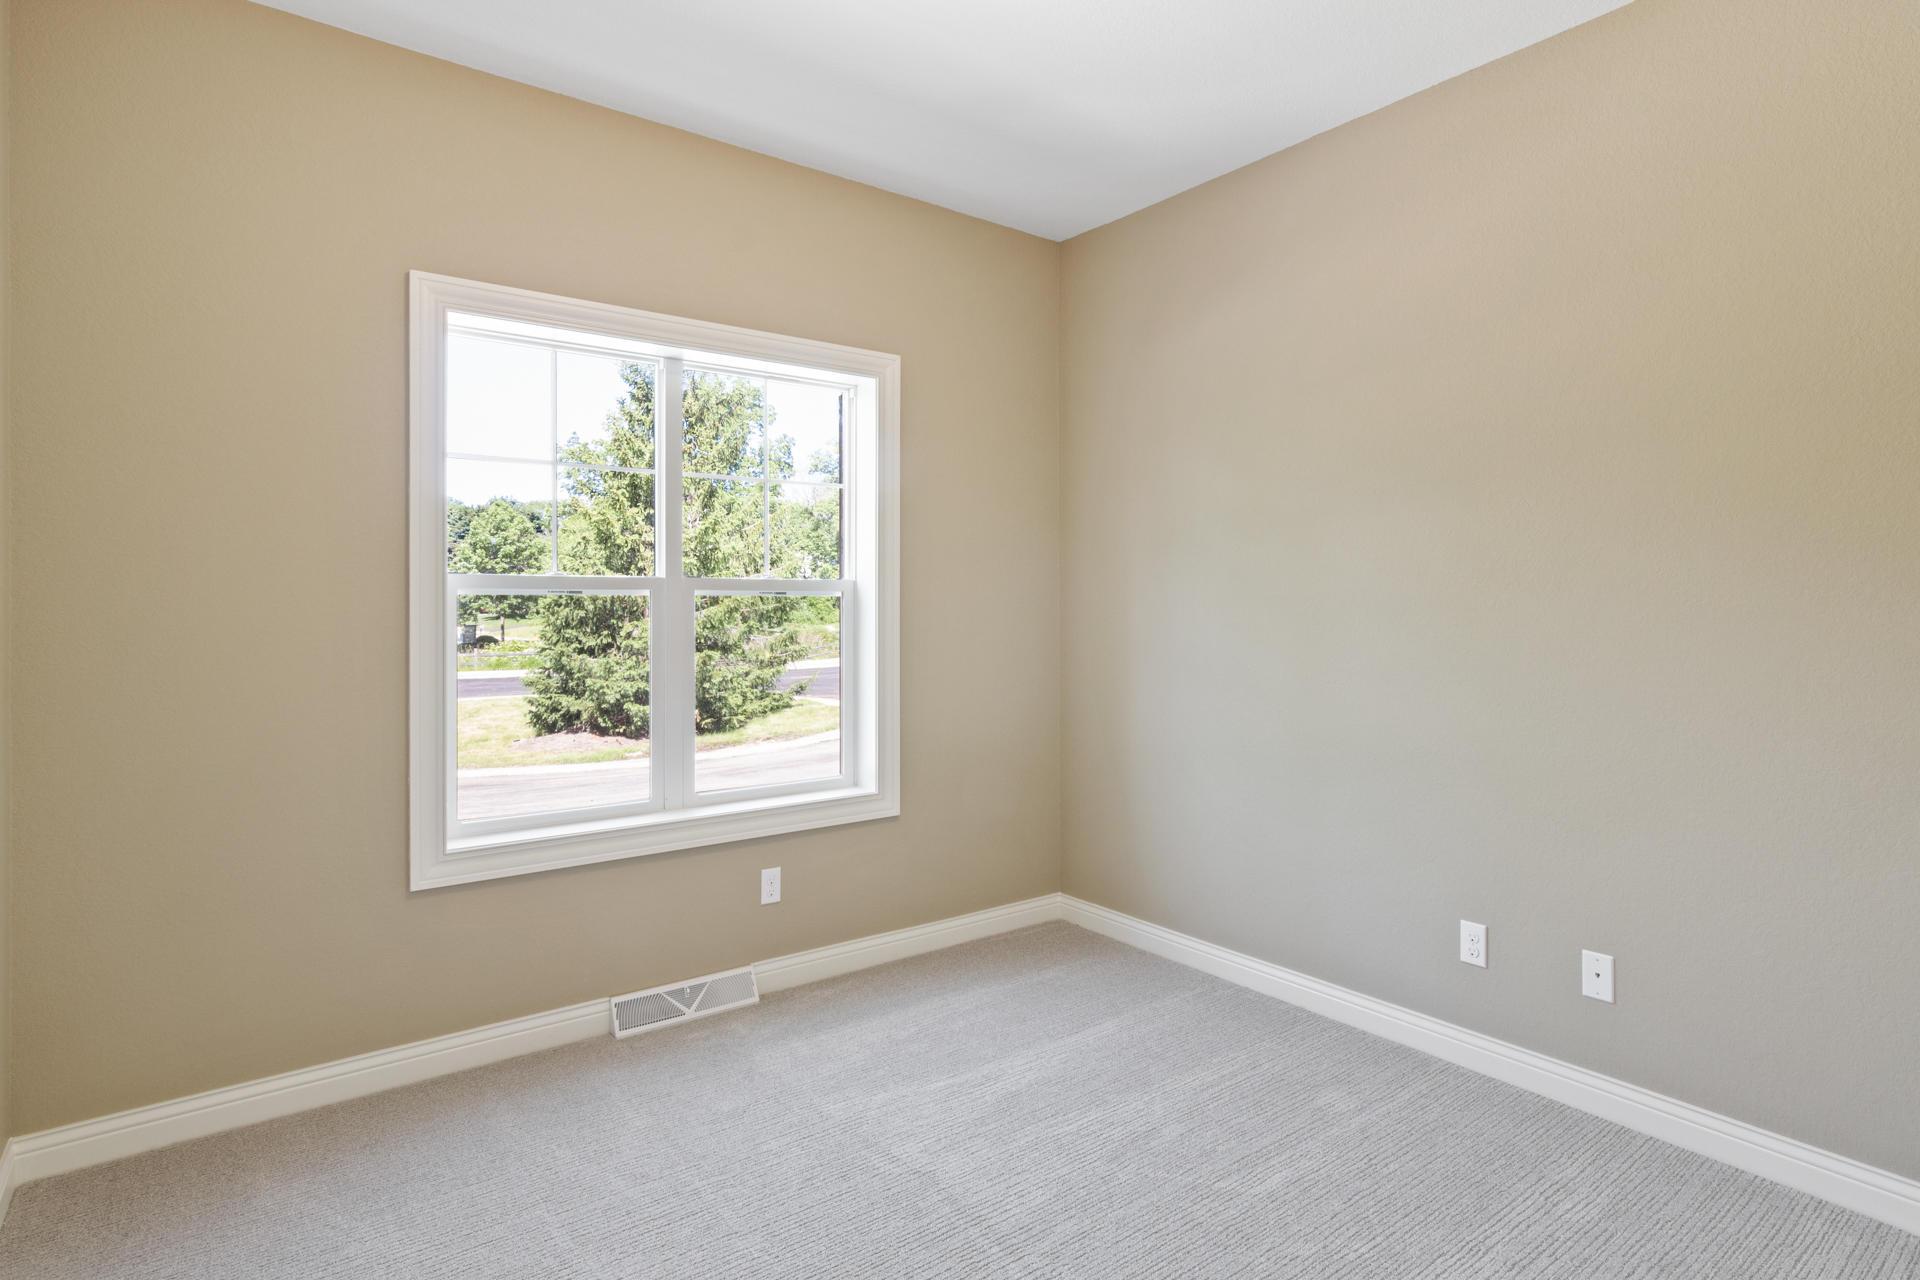 17920 Ashlea Dr, Brookfield, Wisconsin 53045, 3 Bedrooms Bedrooms, 7 Rooms Rooms,3 BathroomsBathrooms,Condominiums,For Sale,Ashlea Dr,1,1667490